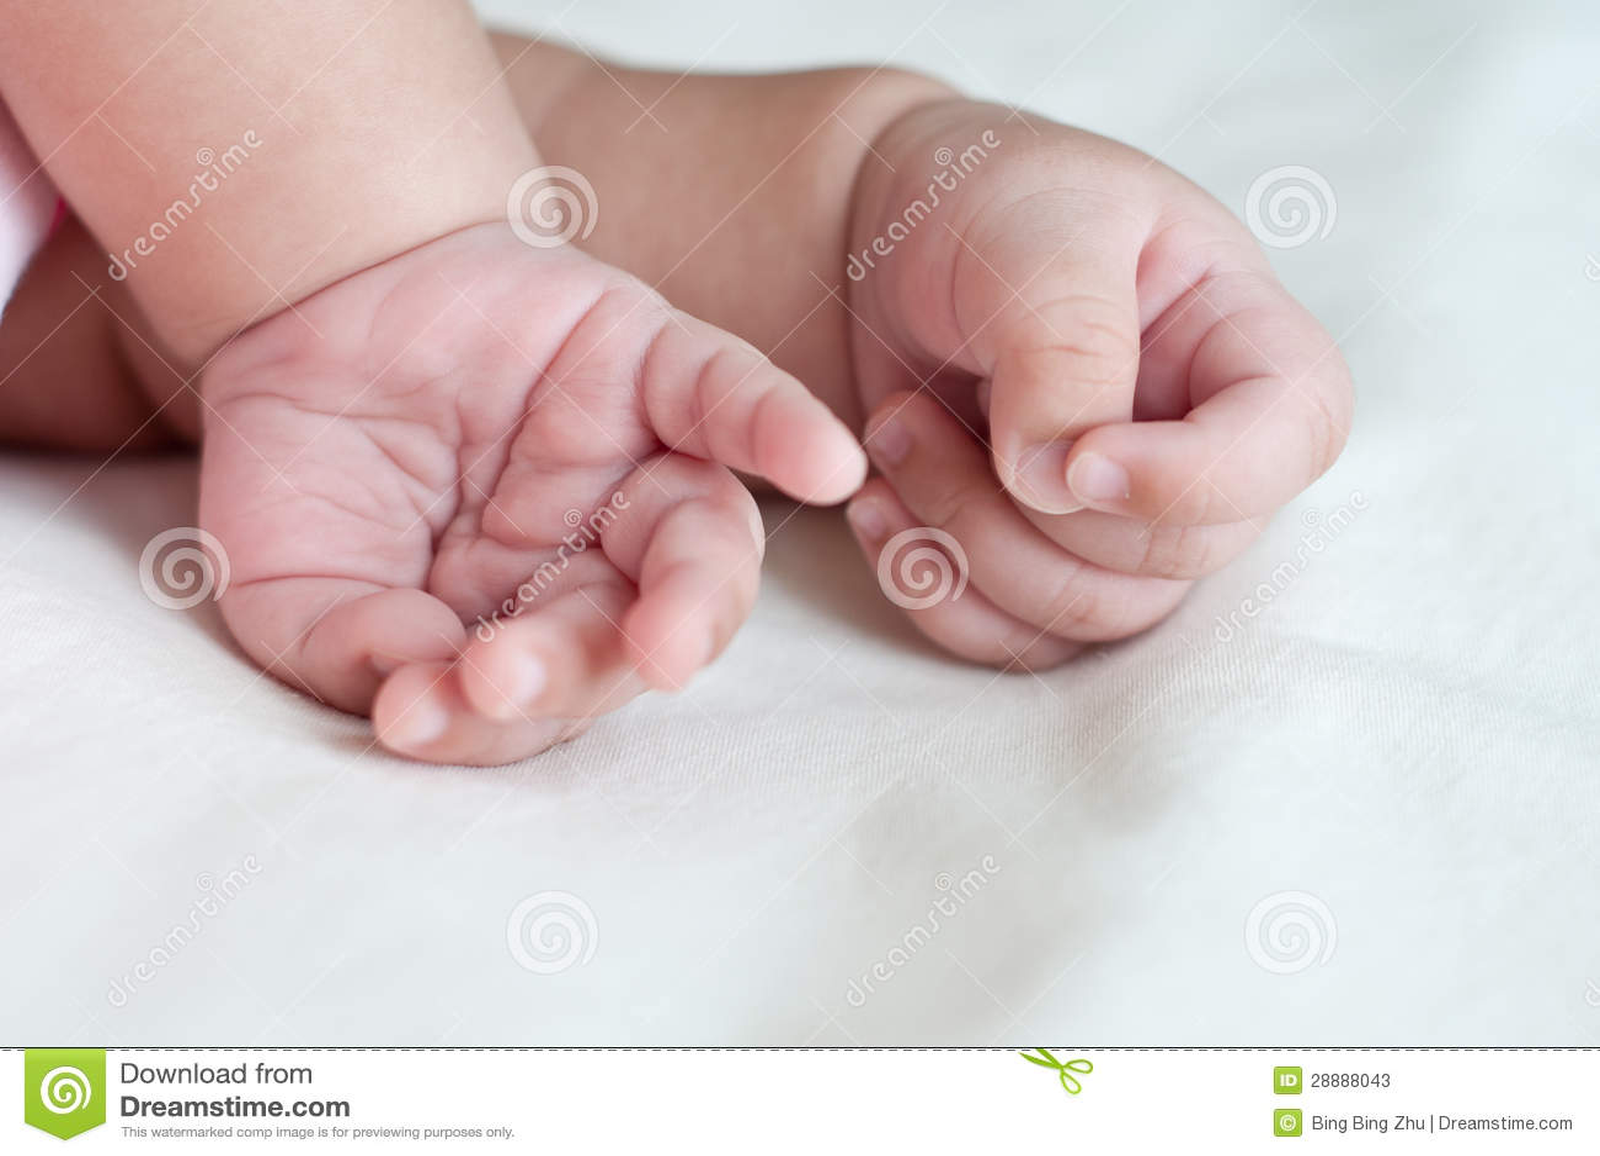 Baby hands stock image. Image of finger, body, hands ...